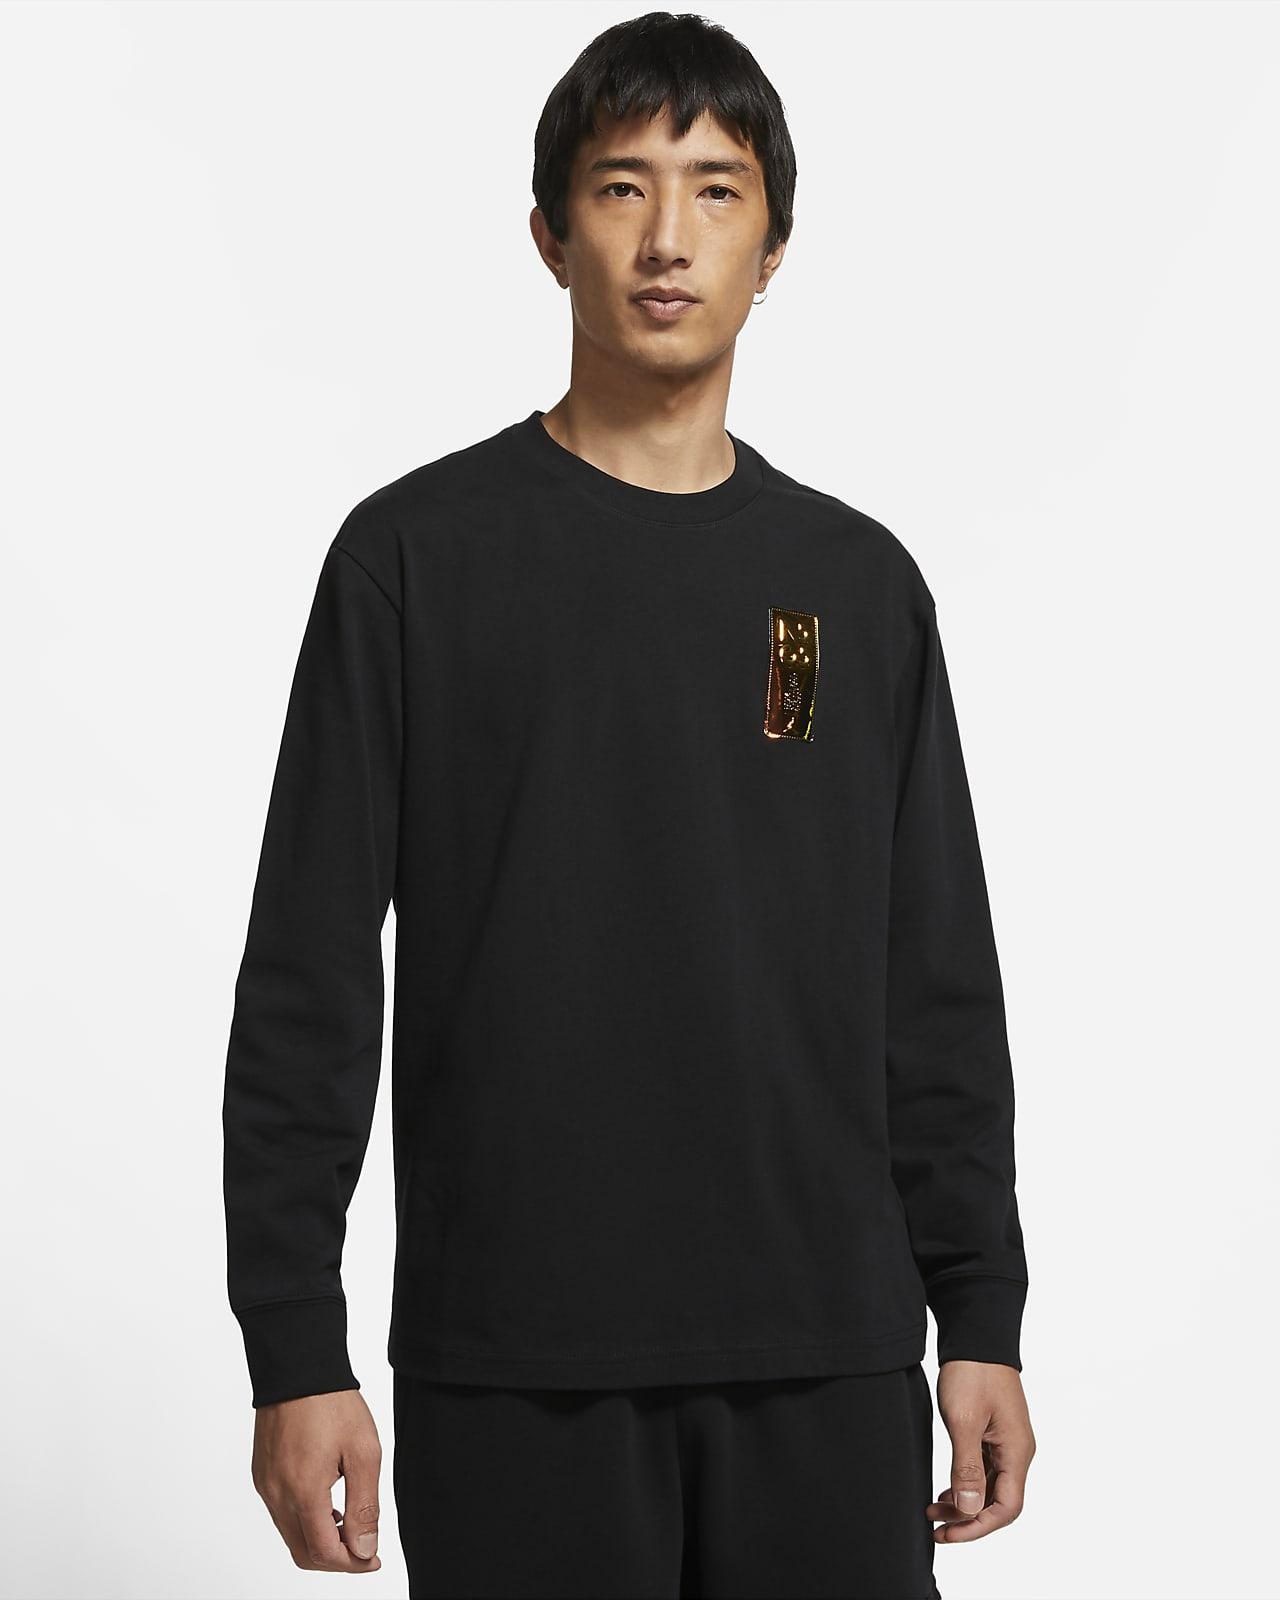 Jordan 23 Engineered Men's Long-Sleeve T-Shirt